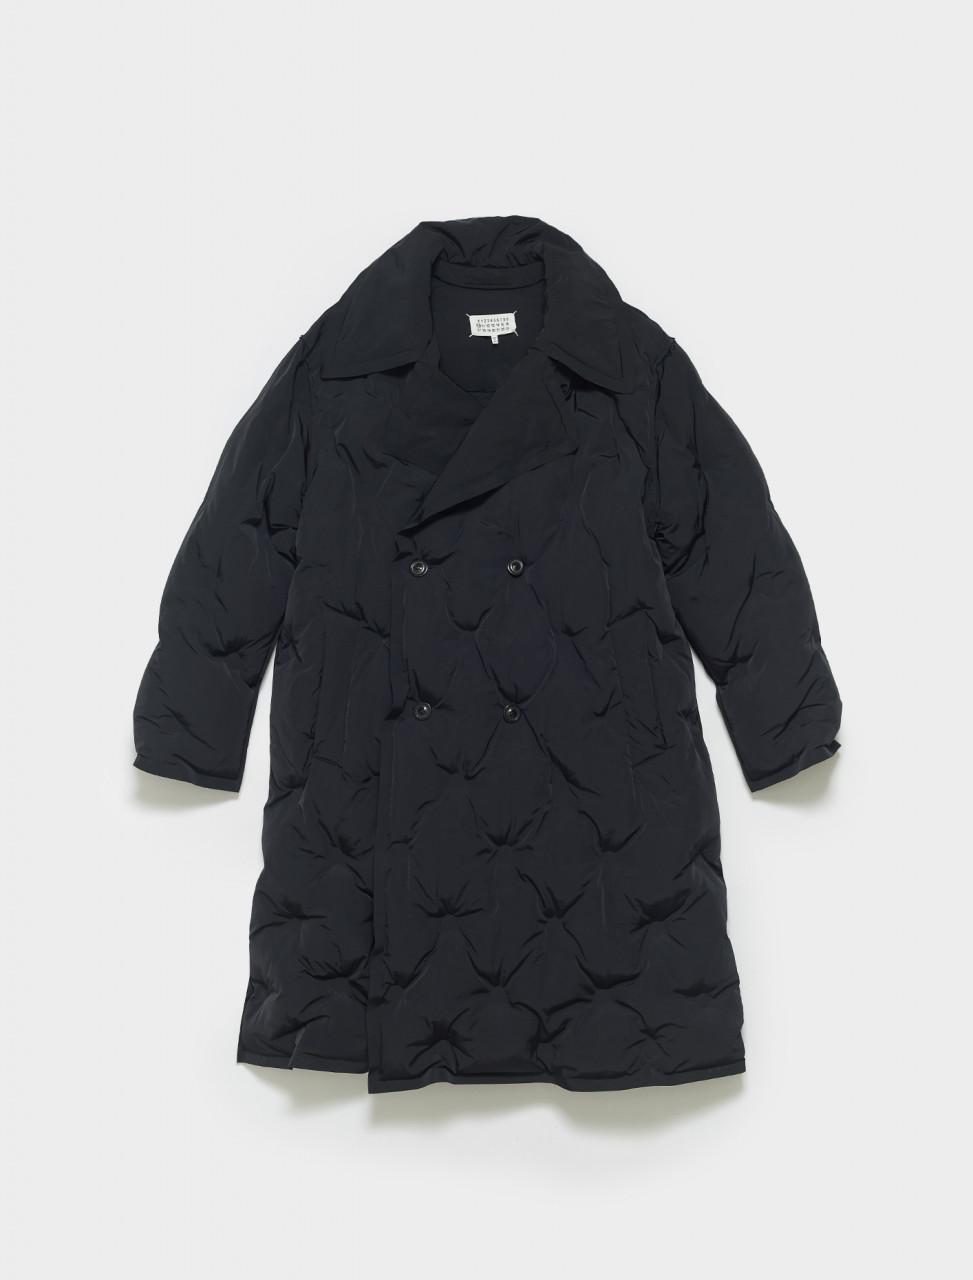 S67AH0002-T079-S52429-900 MAISON MARGIELA NYLON TRENCH COAT IN BLACK